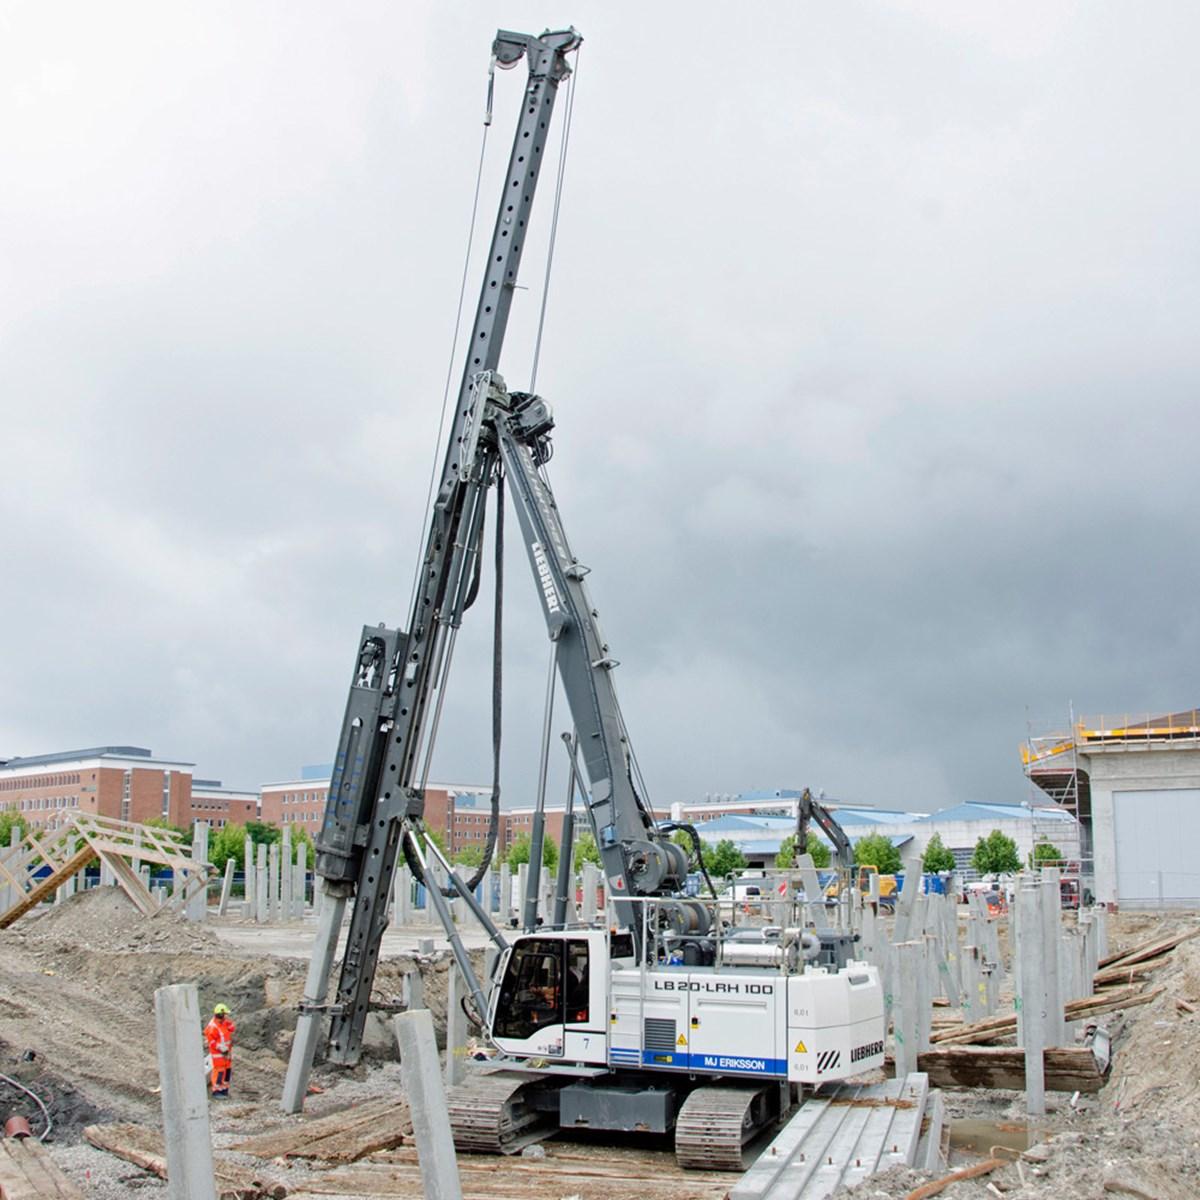 liebherr-lrh-100-rammgerat-ramme-piling-rig-hammer-piles-pfahle-2.jpg